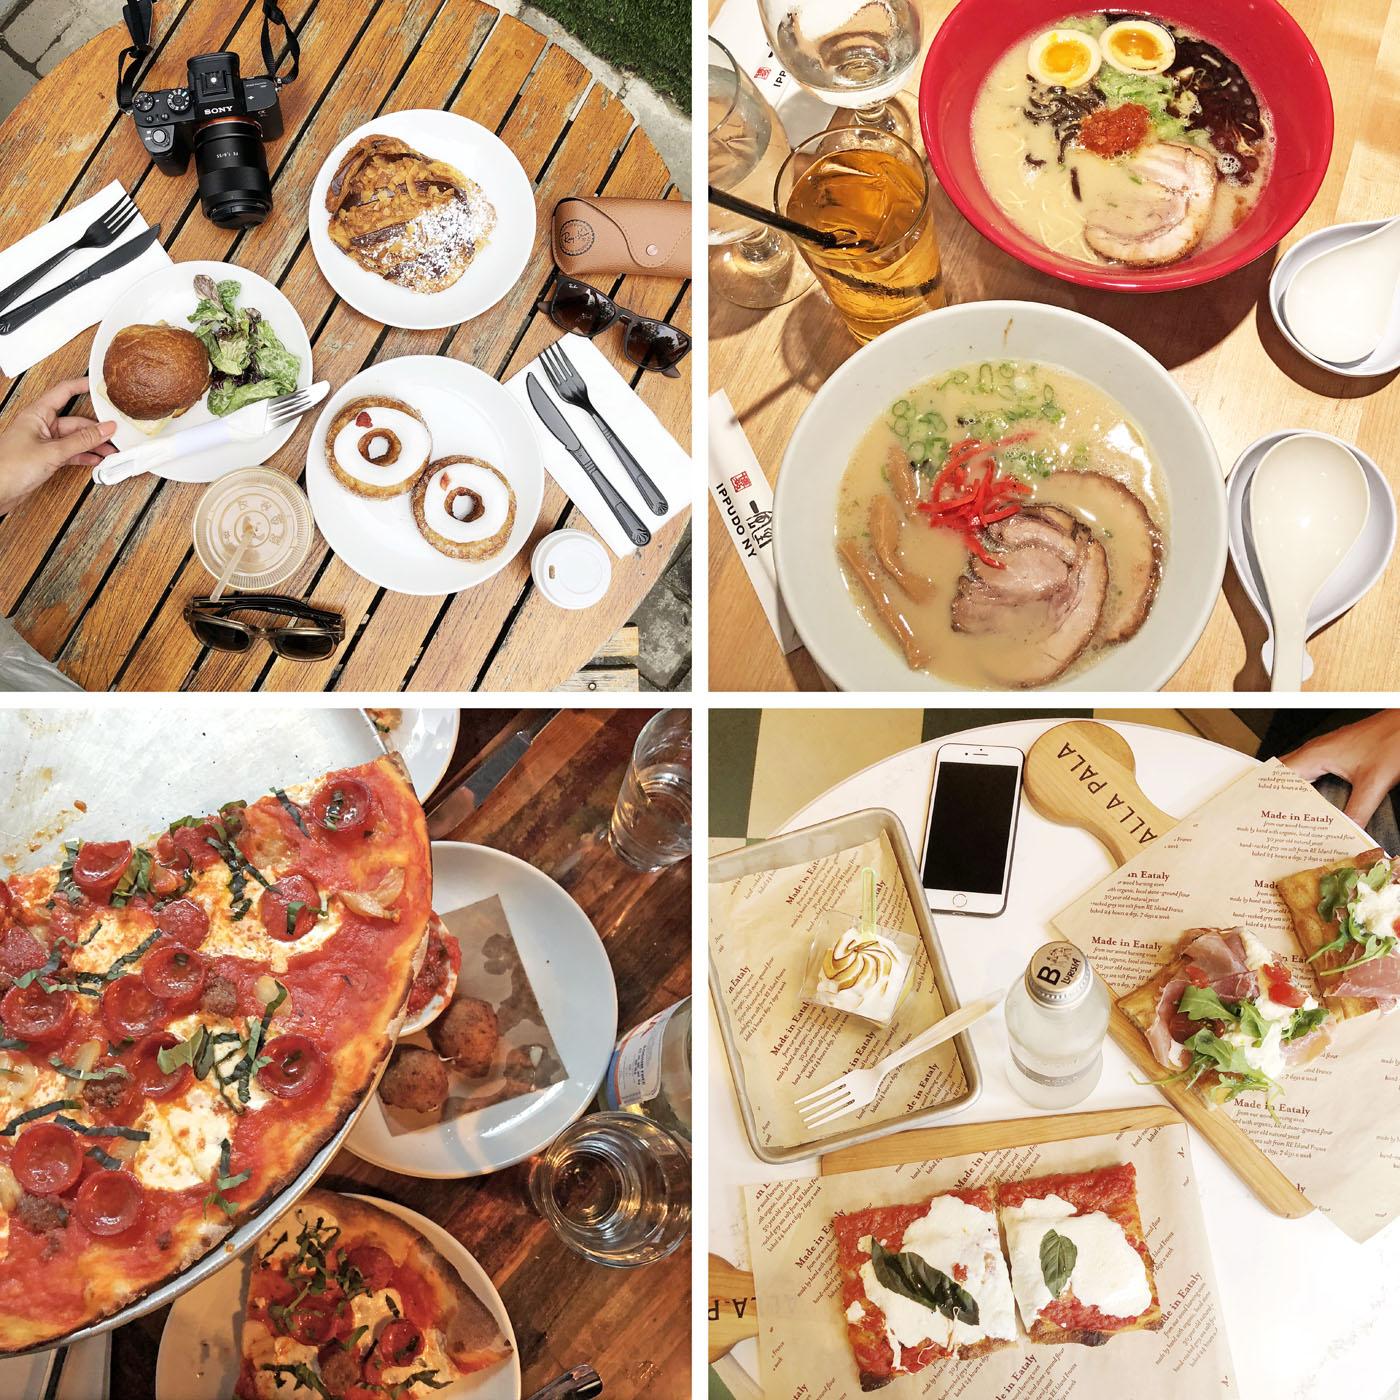 Dominique Ansel Boulangerie, Ippudo Ramen, Eataly, Pizza Rubirosa | NYC Eats